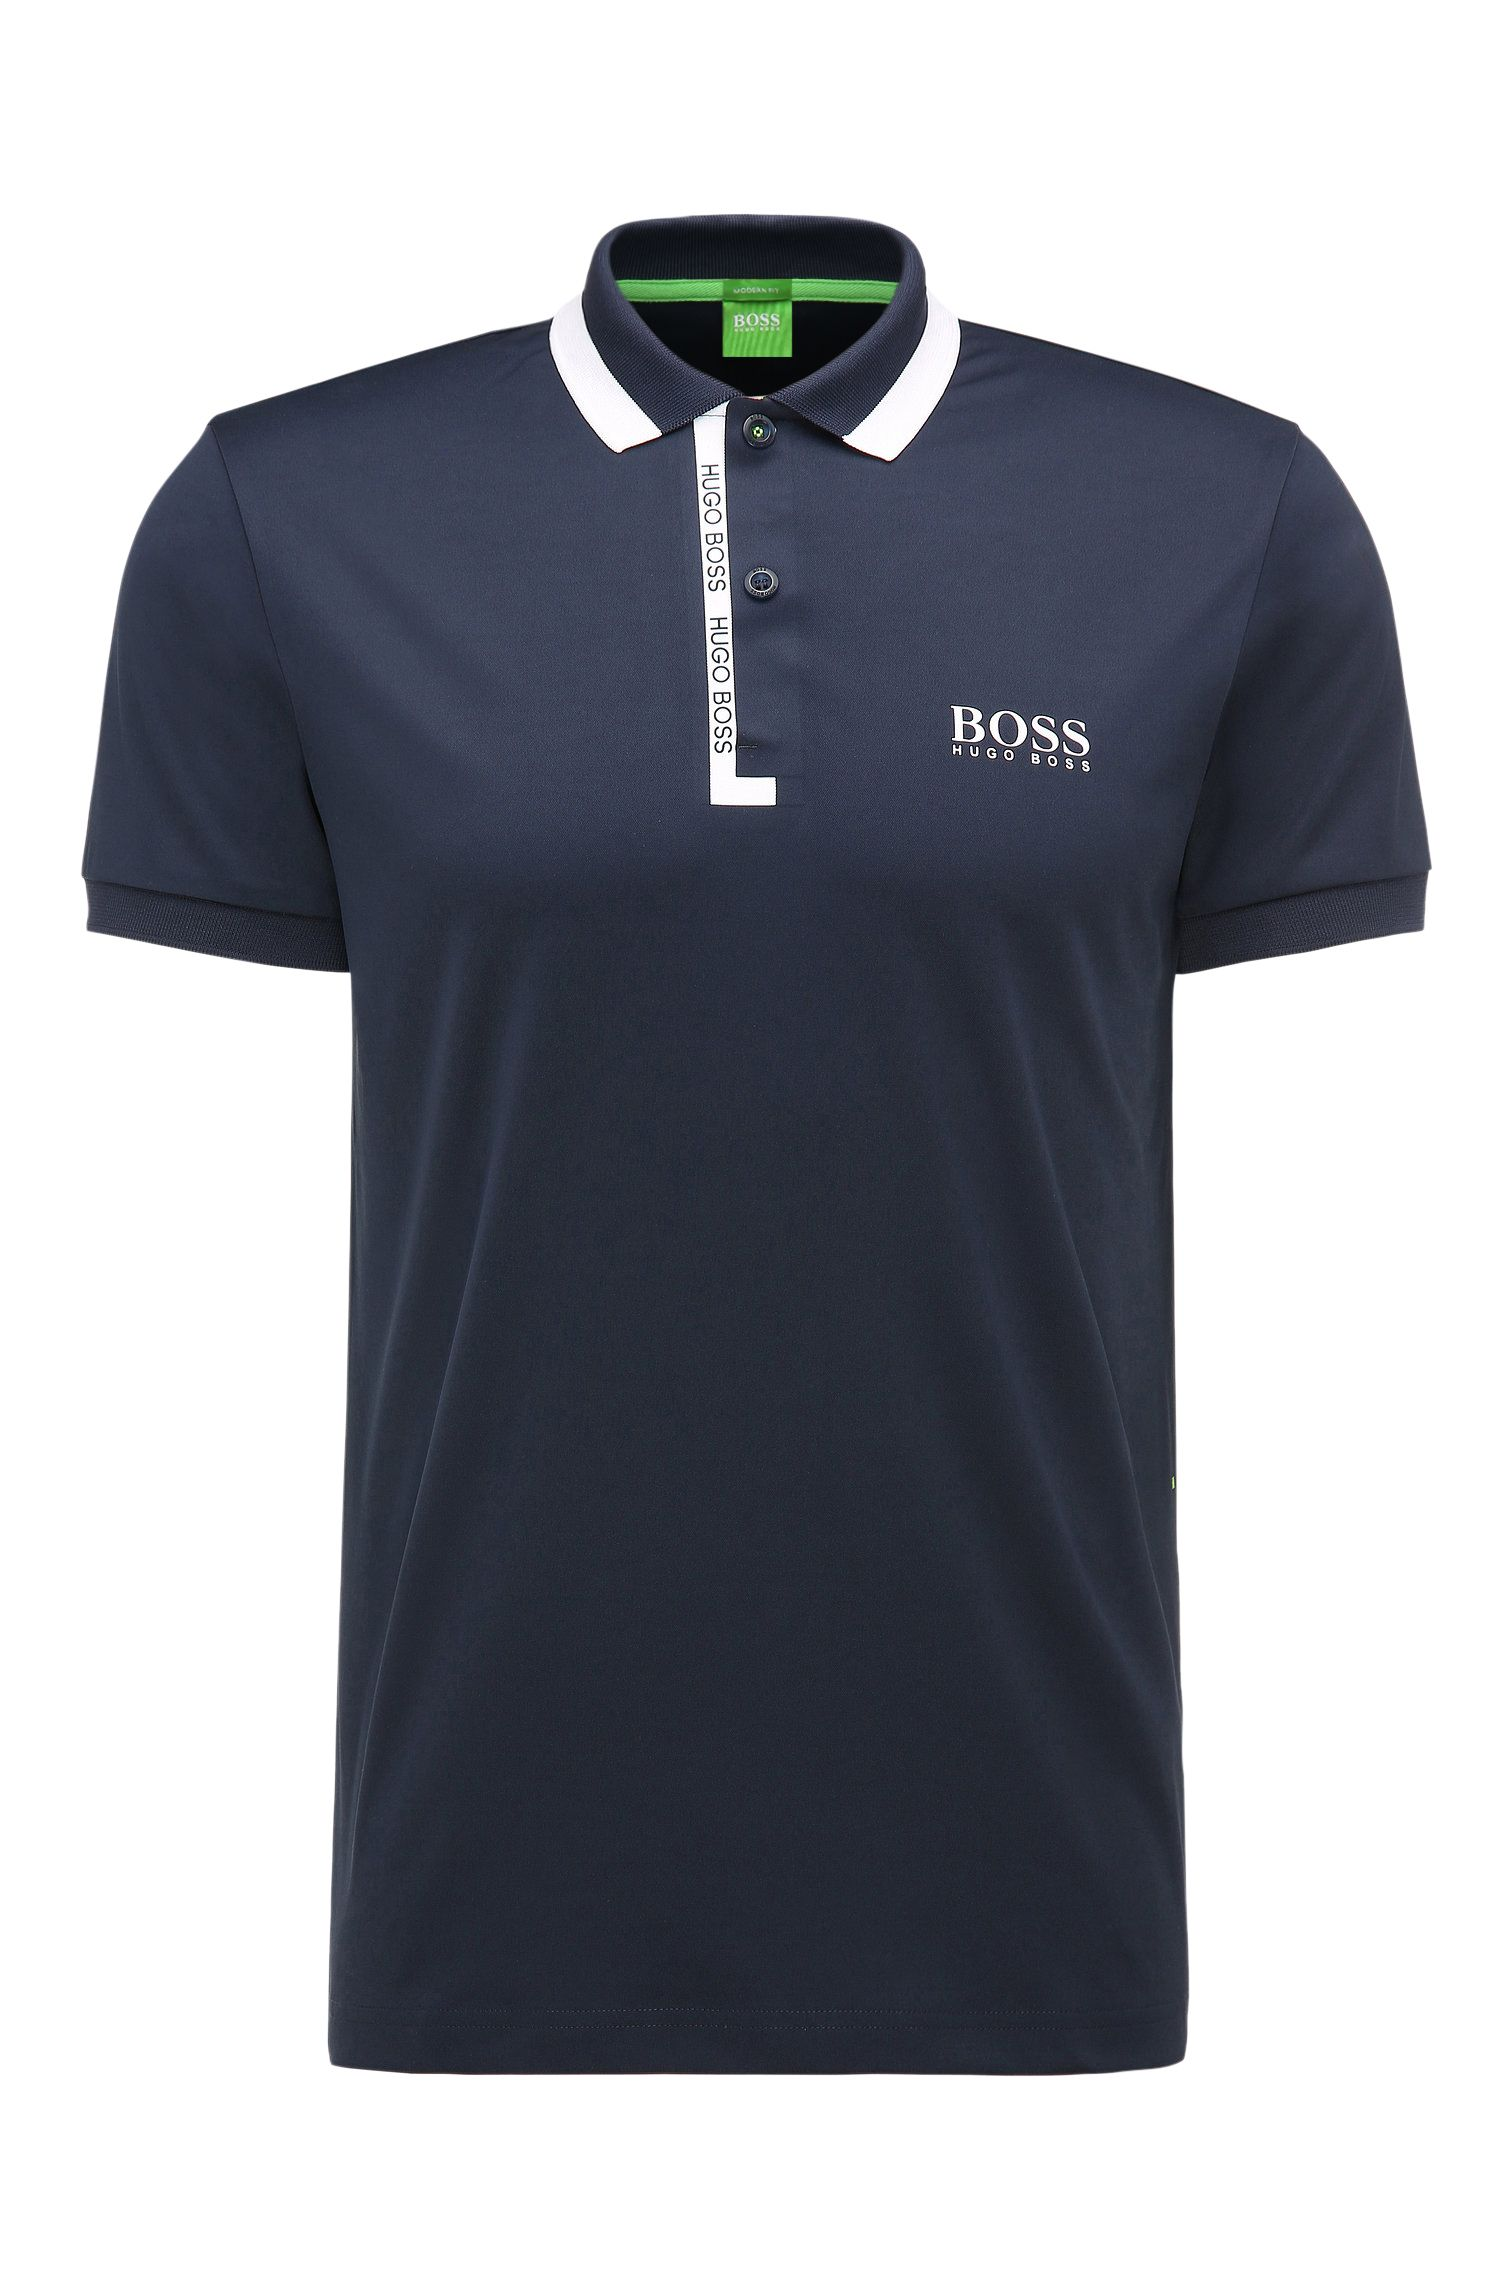 Regular-Fit Poloshirt aus elastischem Material-Mix: ´Paddy Pro 2`